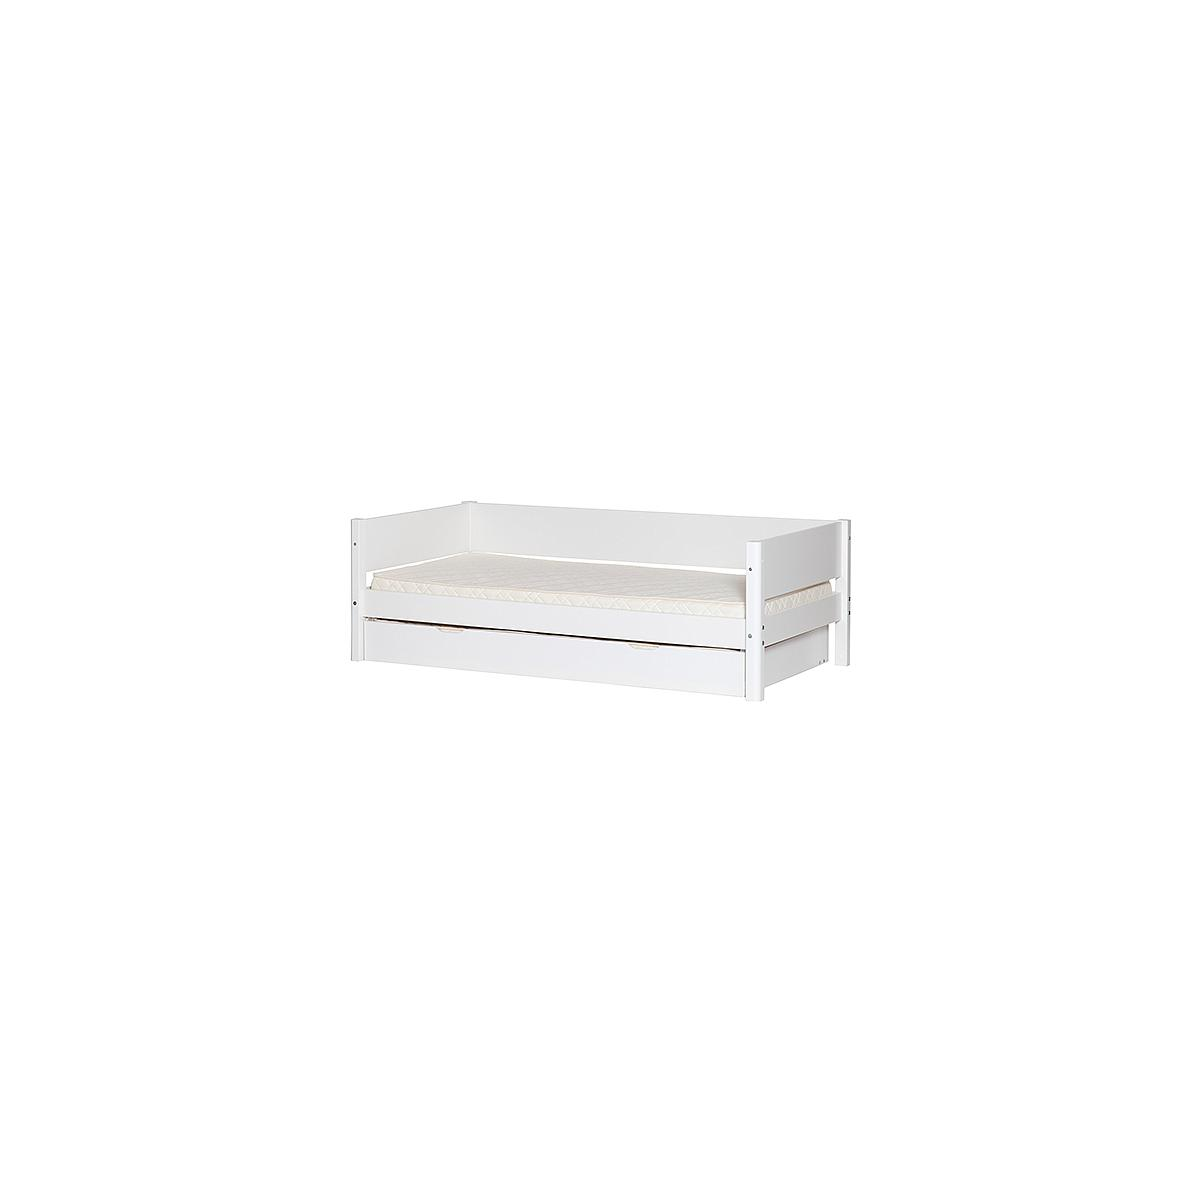 Barrera trasera Cama 90x190 cm WHITE blanca